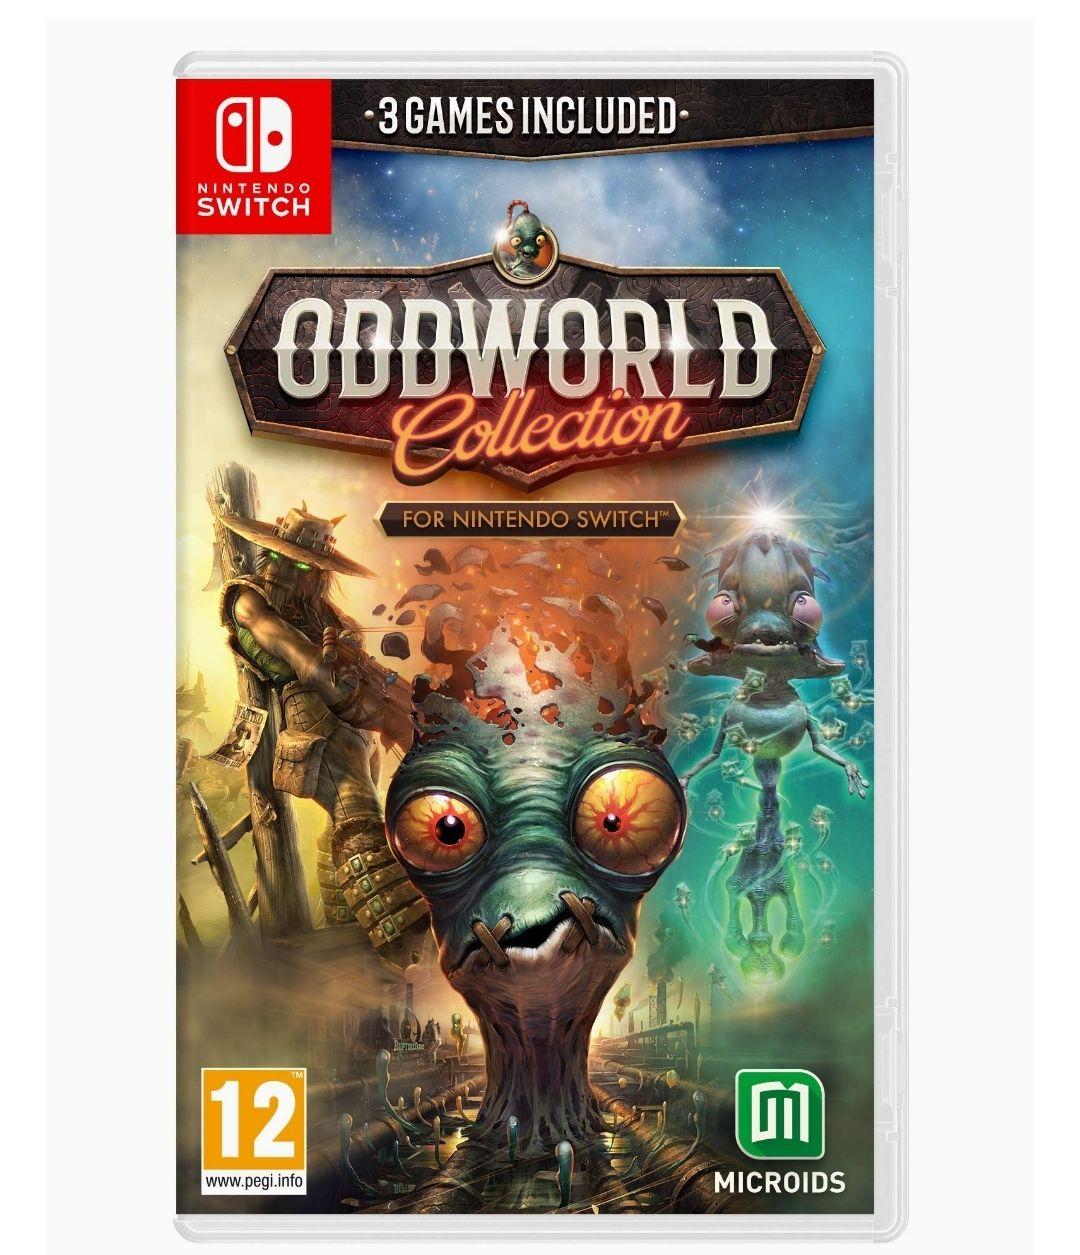 Oddworld Collection sur Nintendo Switch